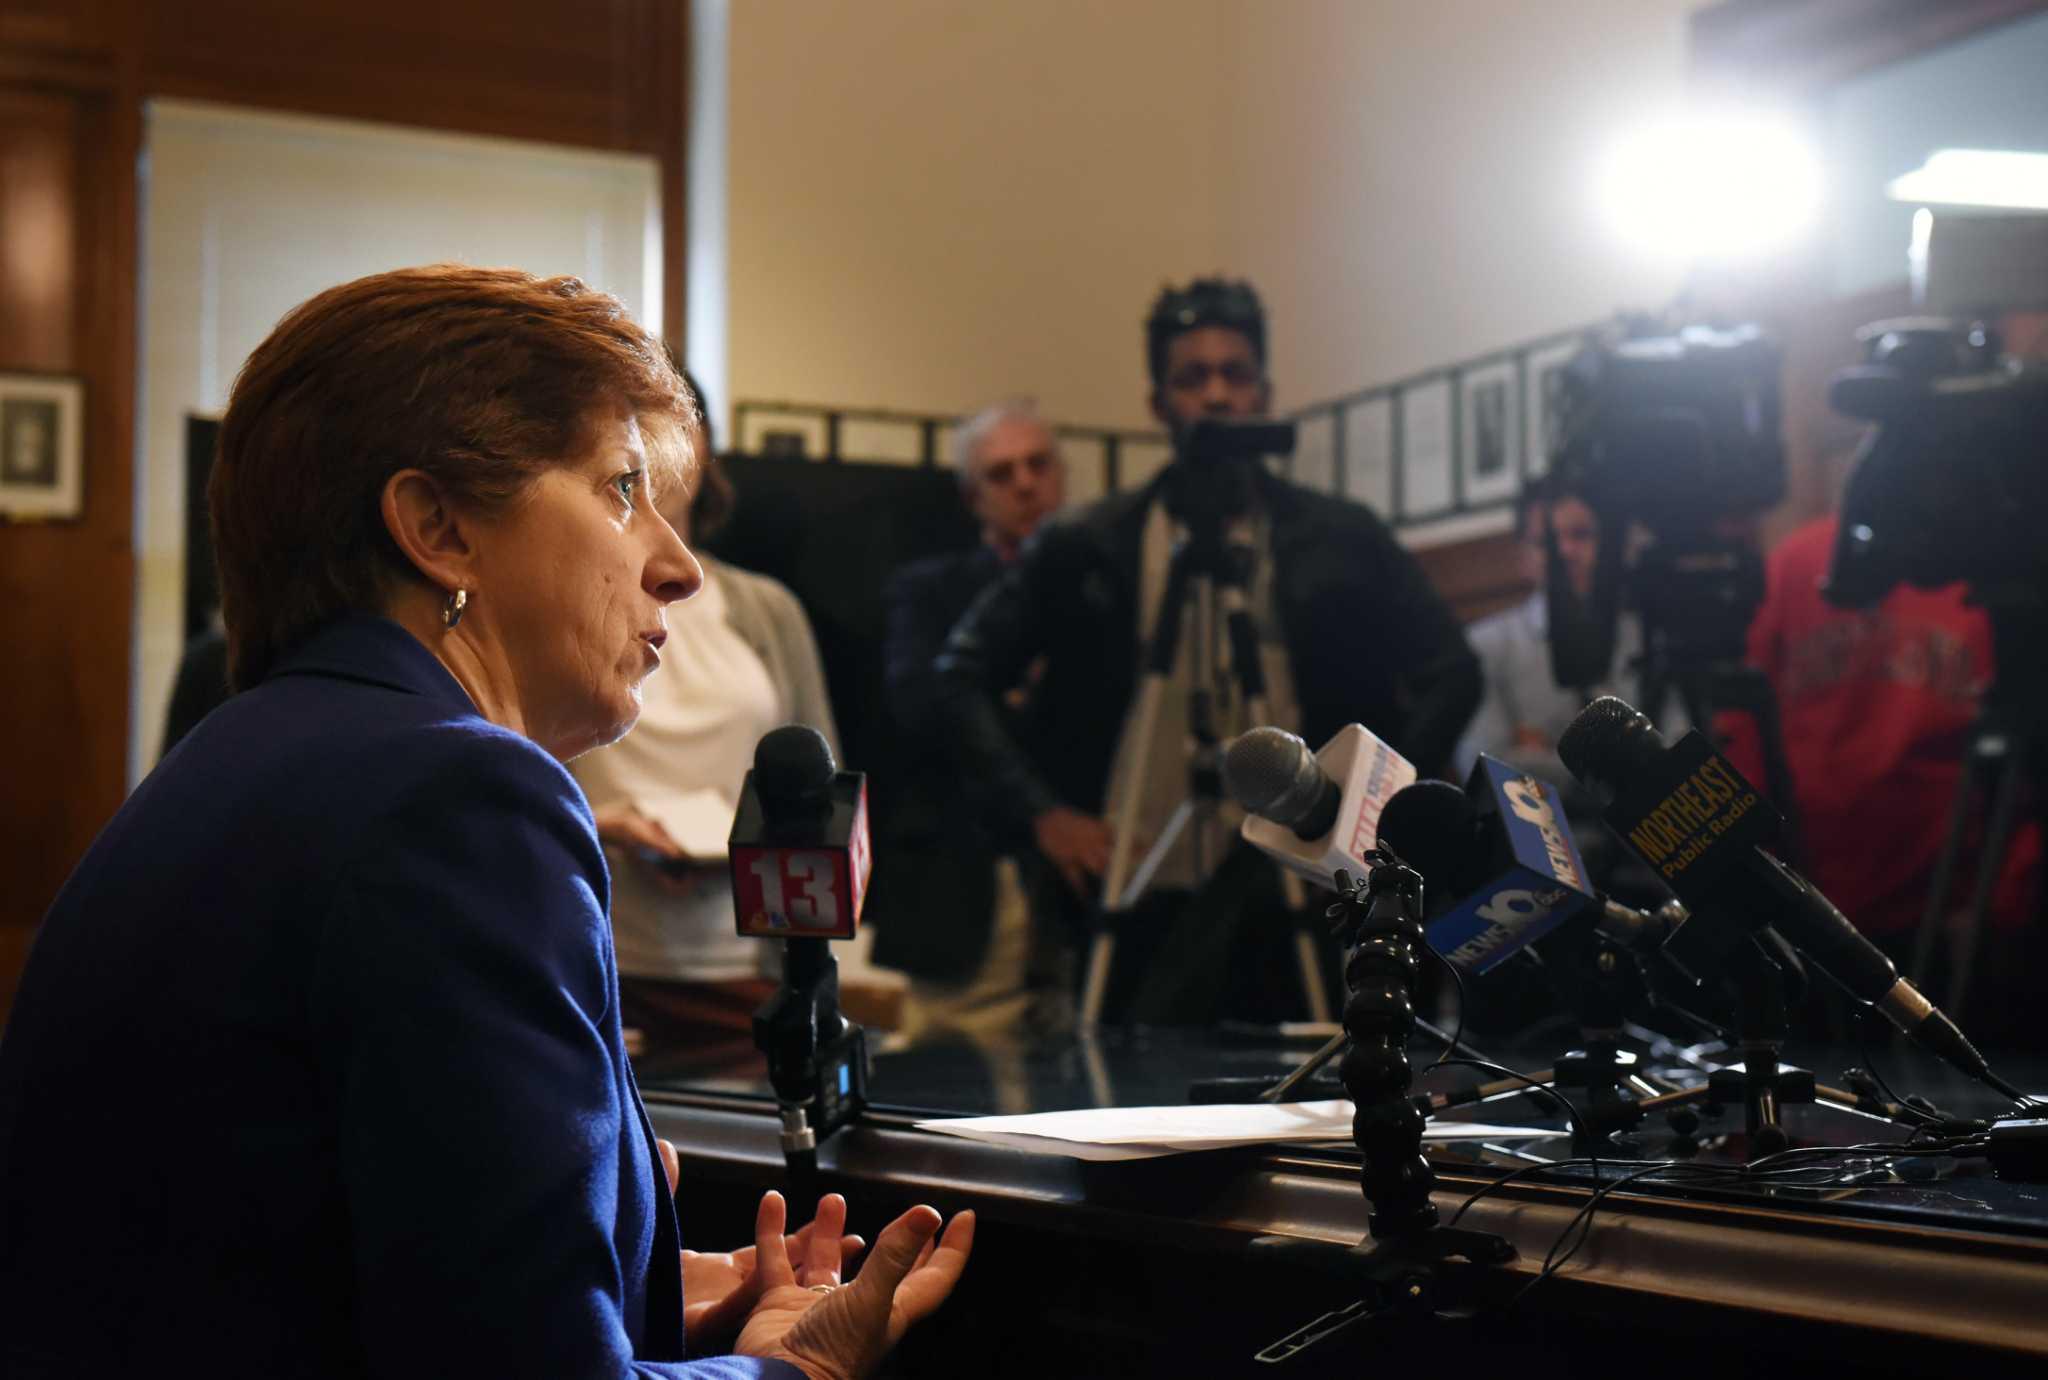 Ransomware attacks upstate draw Schumer pledges